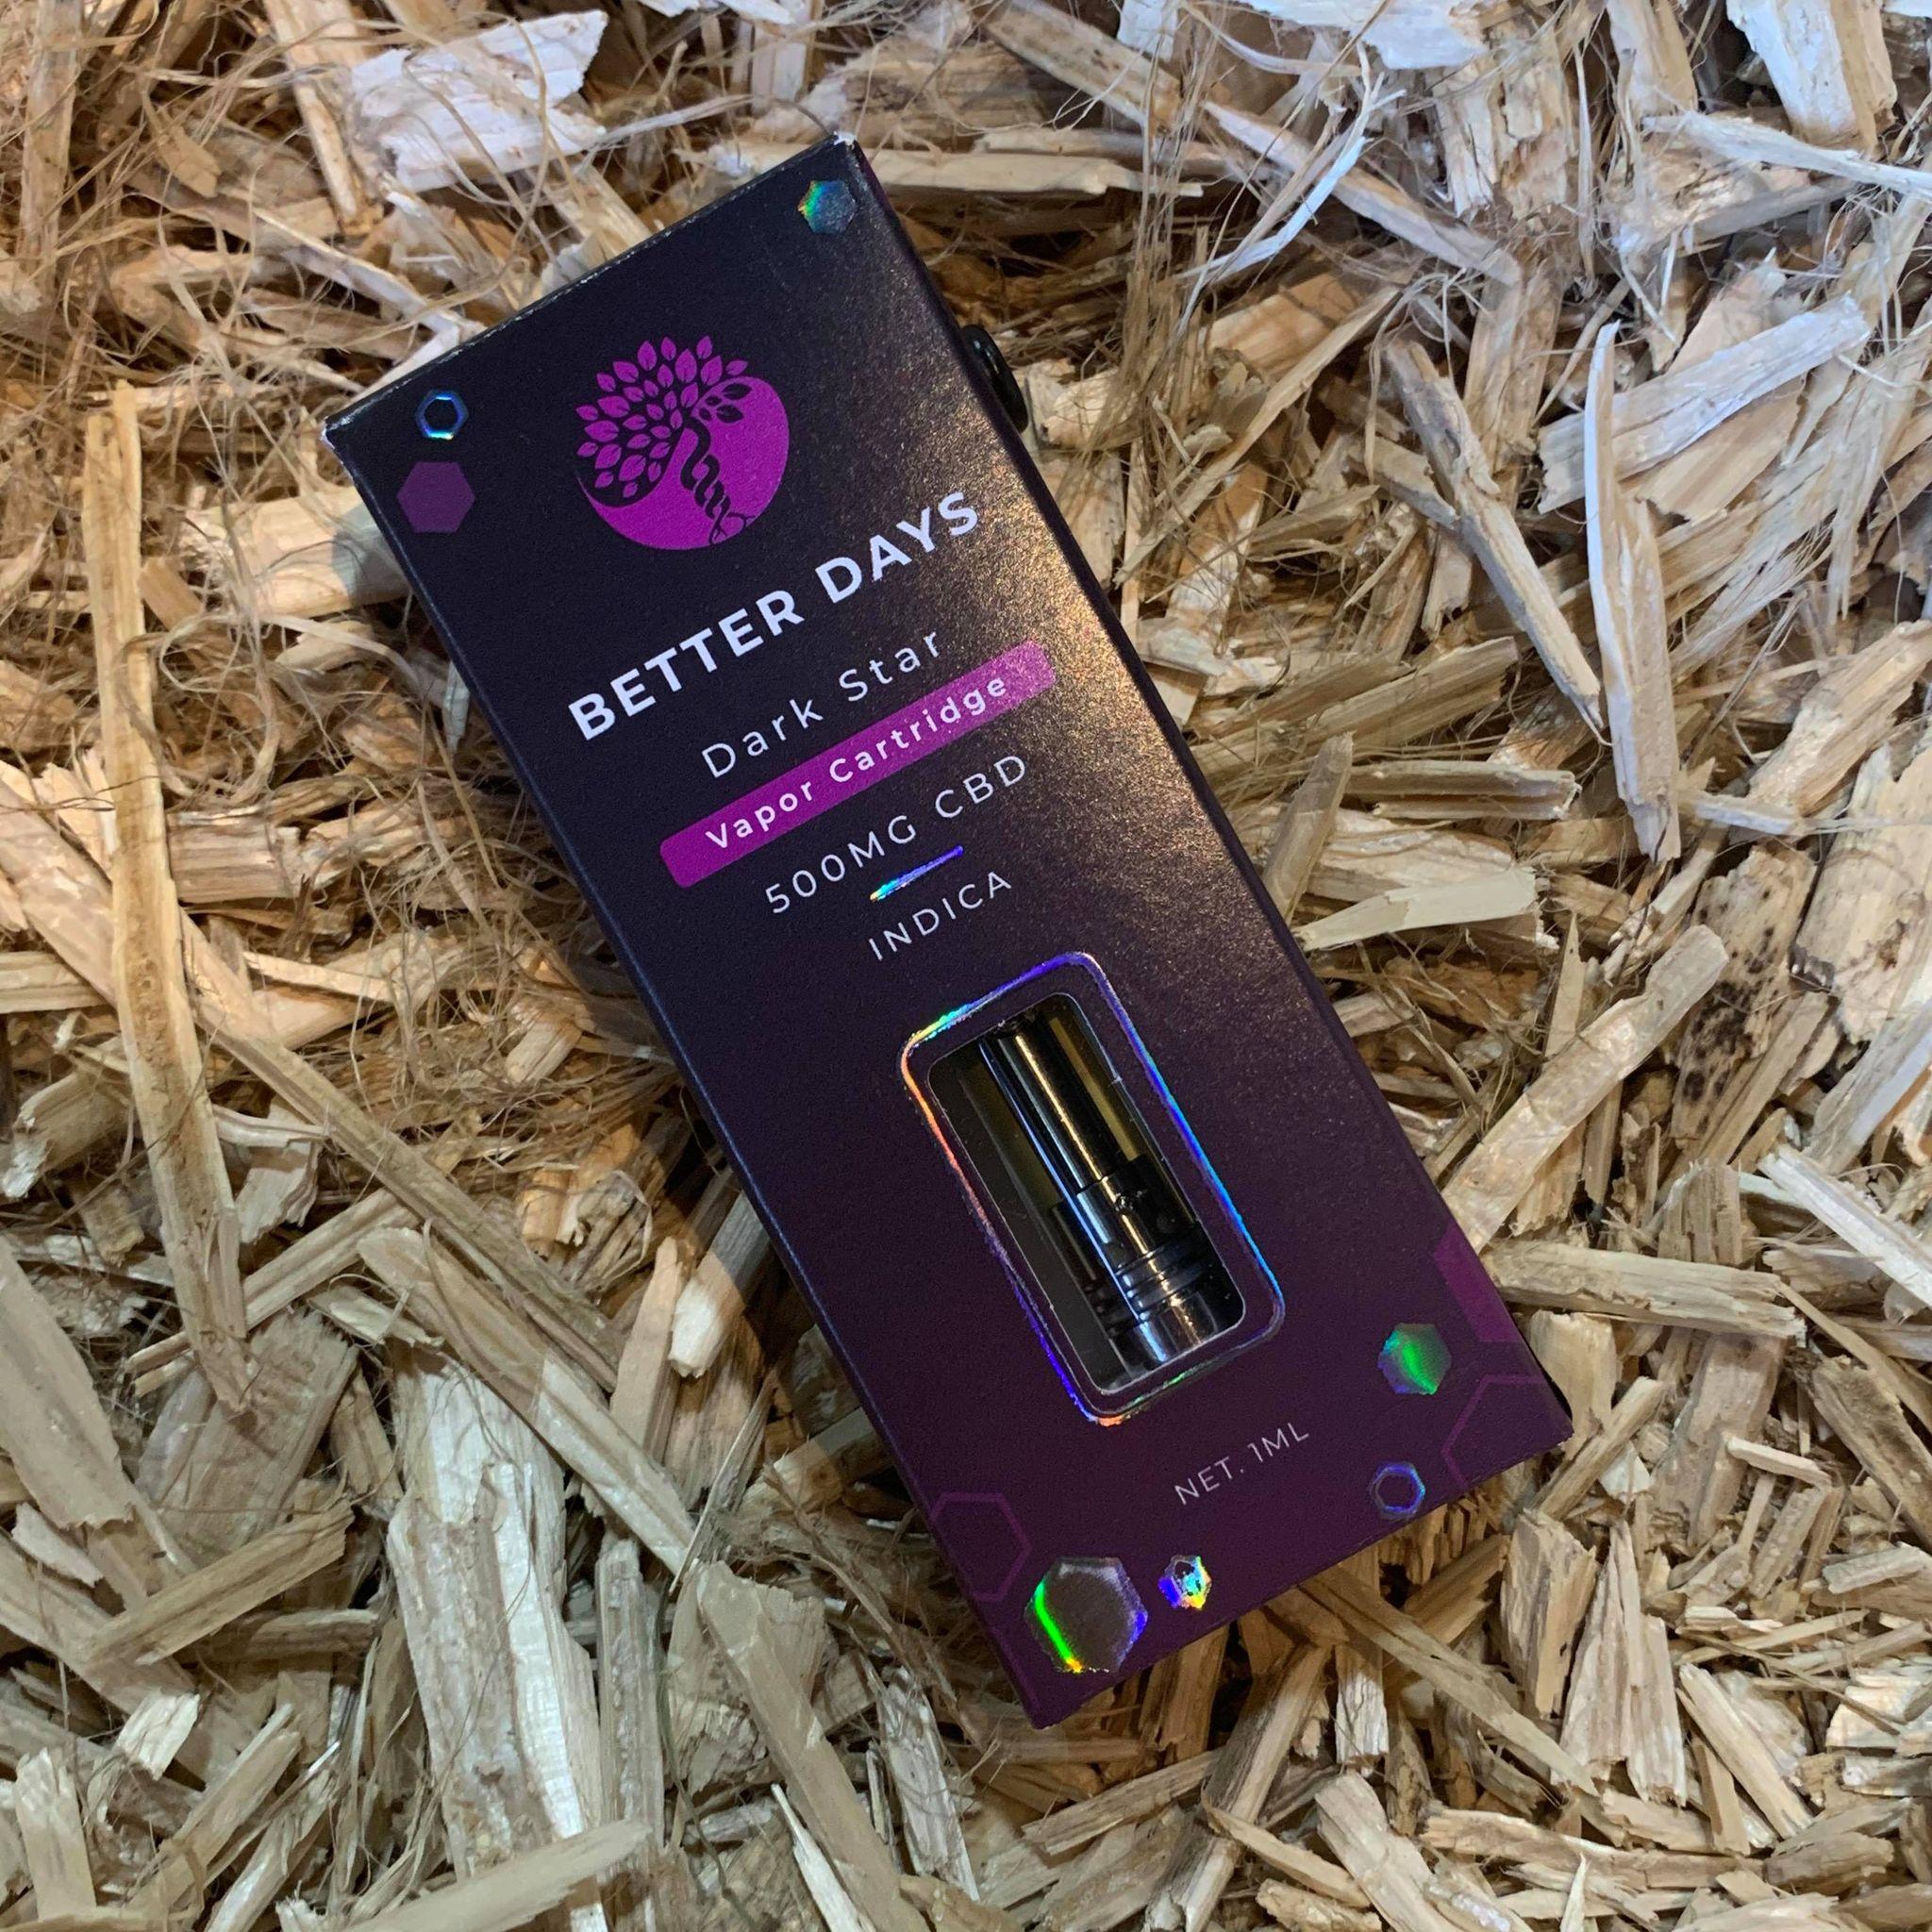 Creating Better Days 500mg CBD Cartridge